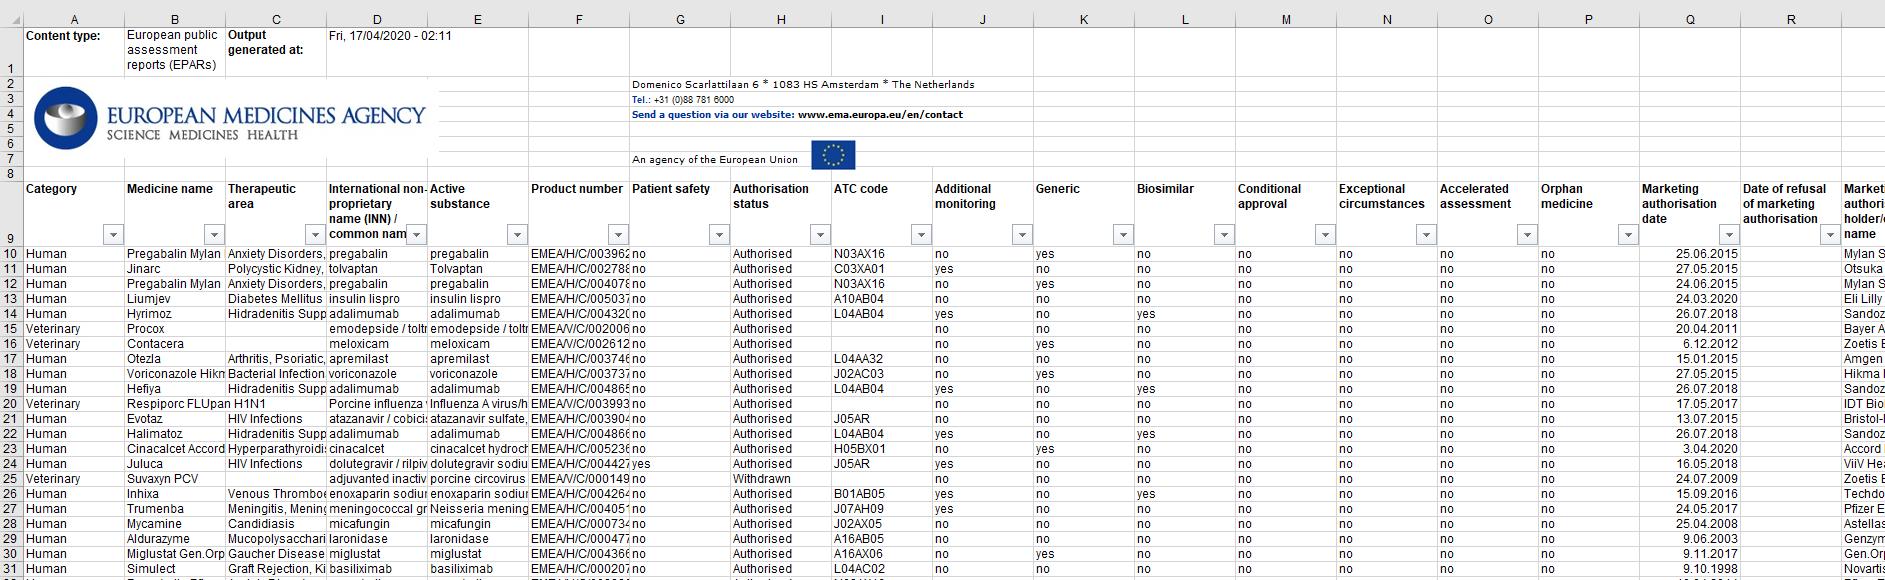 European public assessment reports